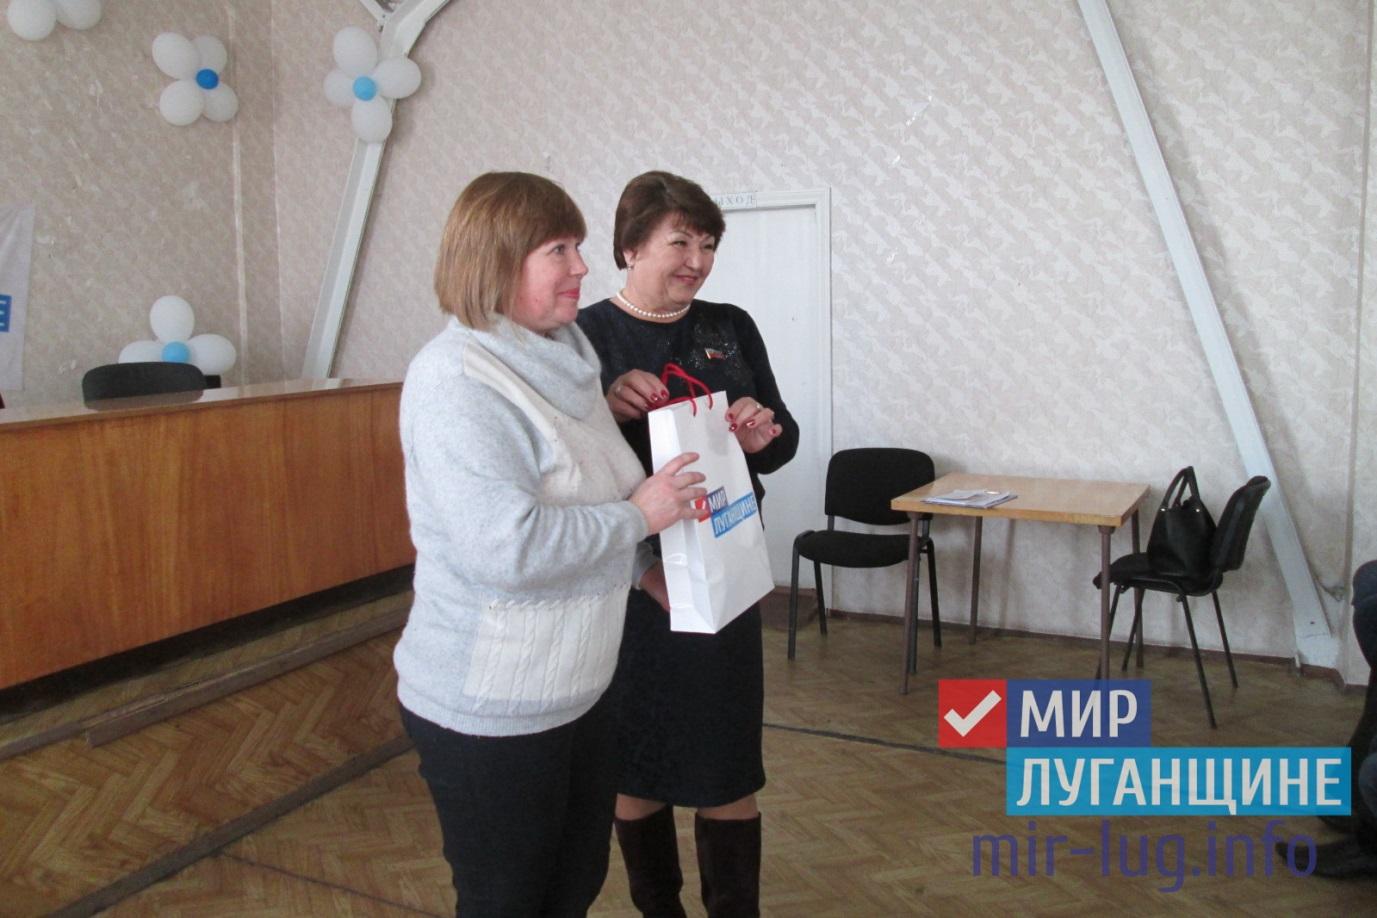 Депутат Народного совета ЛНР Елена Рахмукова встретилась с жителями Антрацита 4